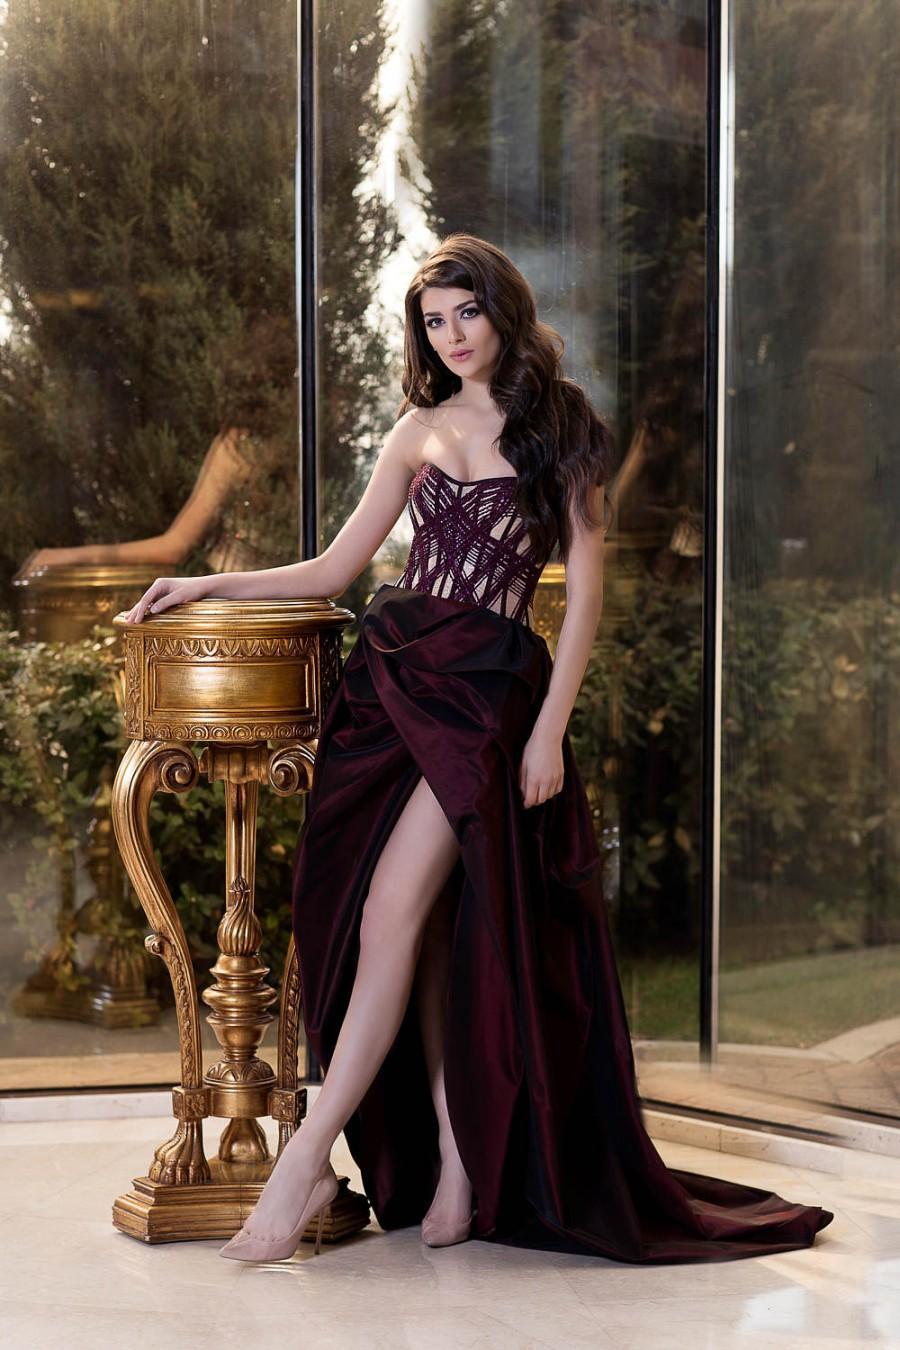 Hochzeit - Long Bridesmaid dress in Marsala color / Formal beaded dress Elegant taffeta dress Couture Sleeveless dress Prom Ball gown Evening dress